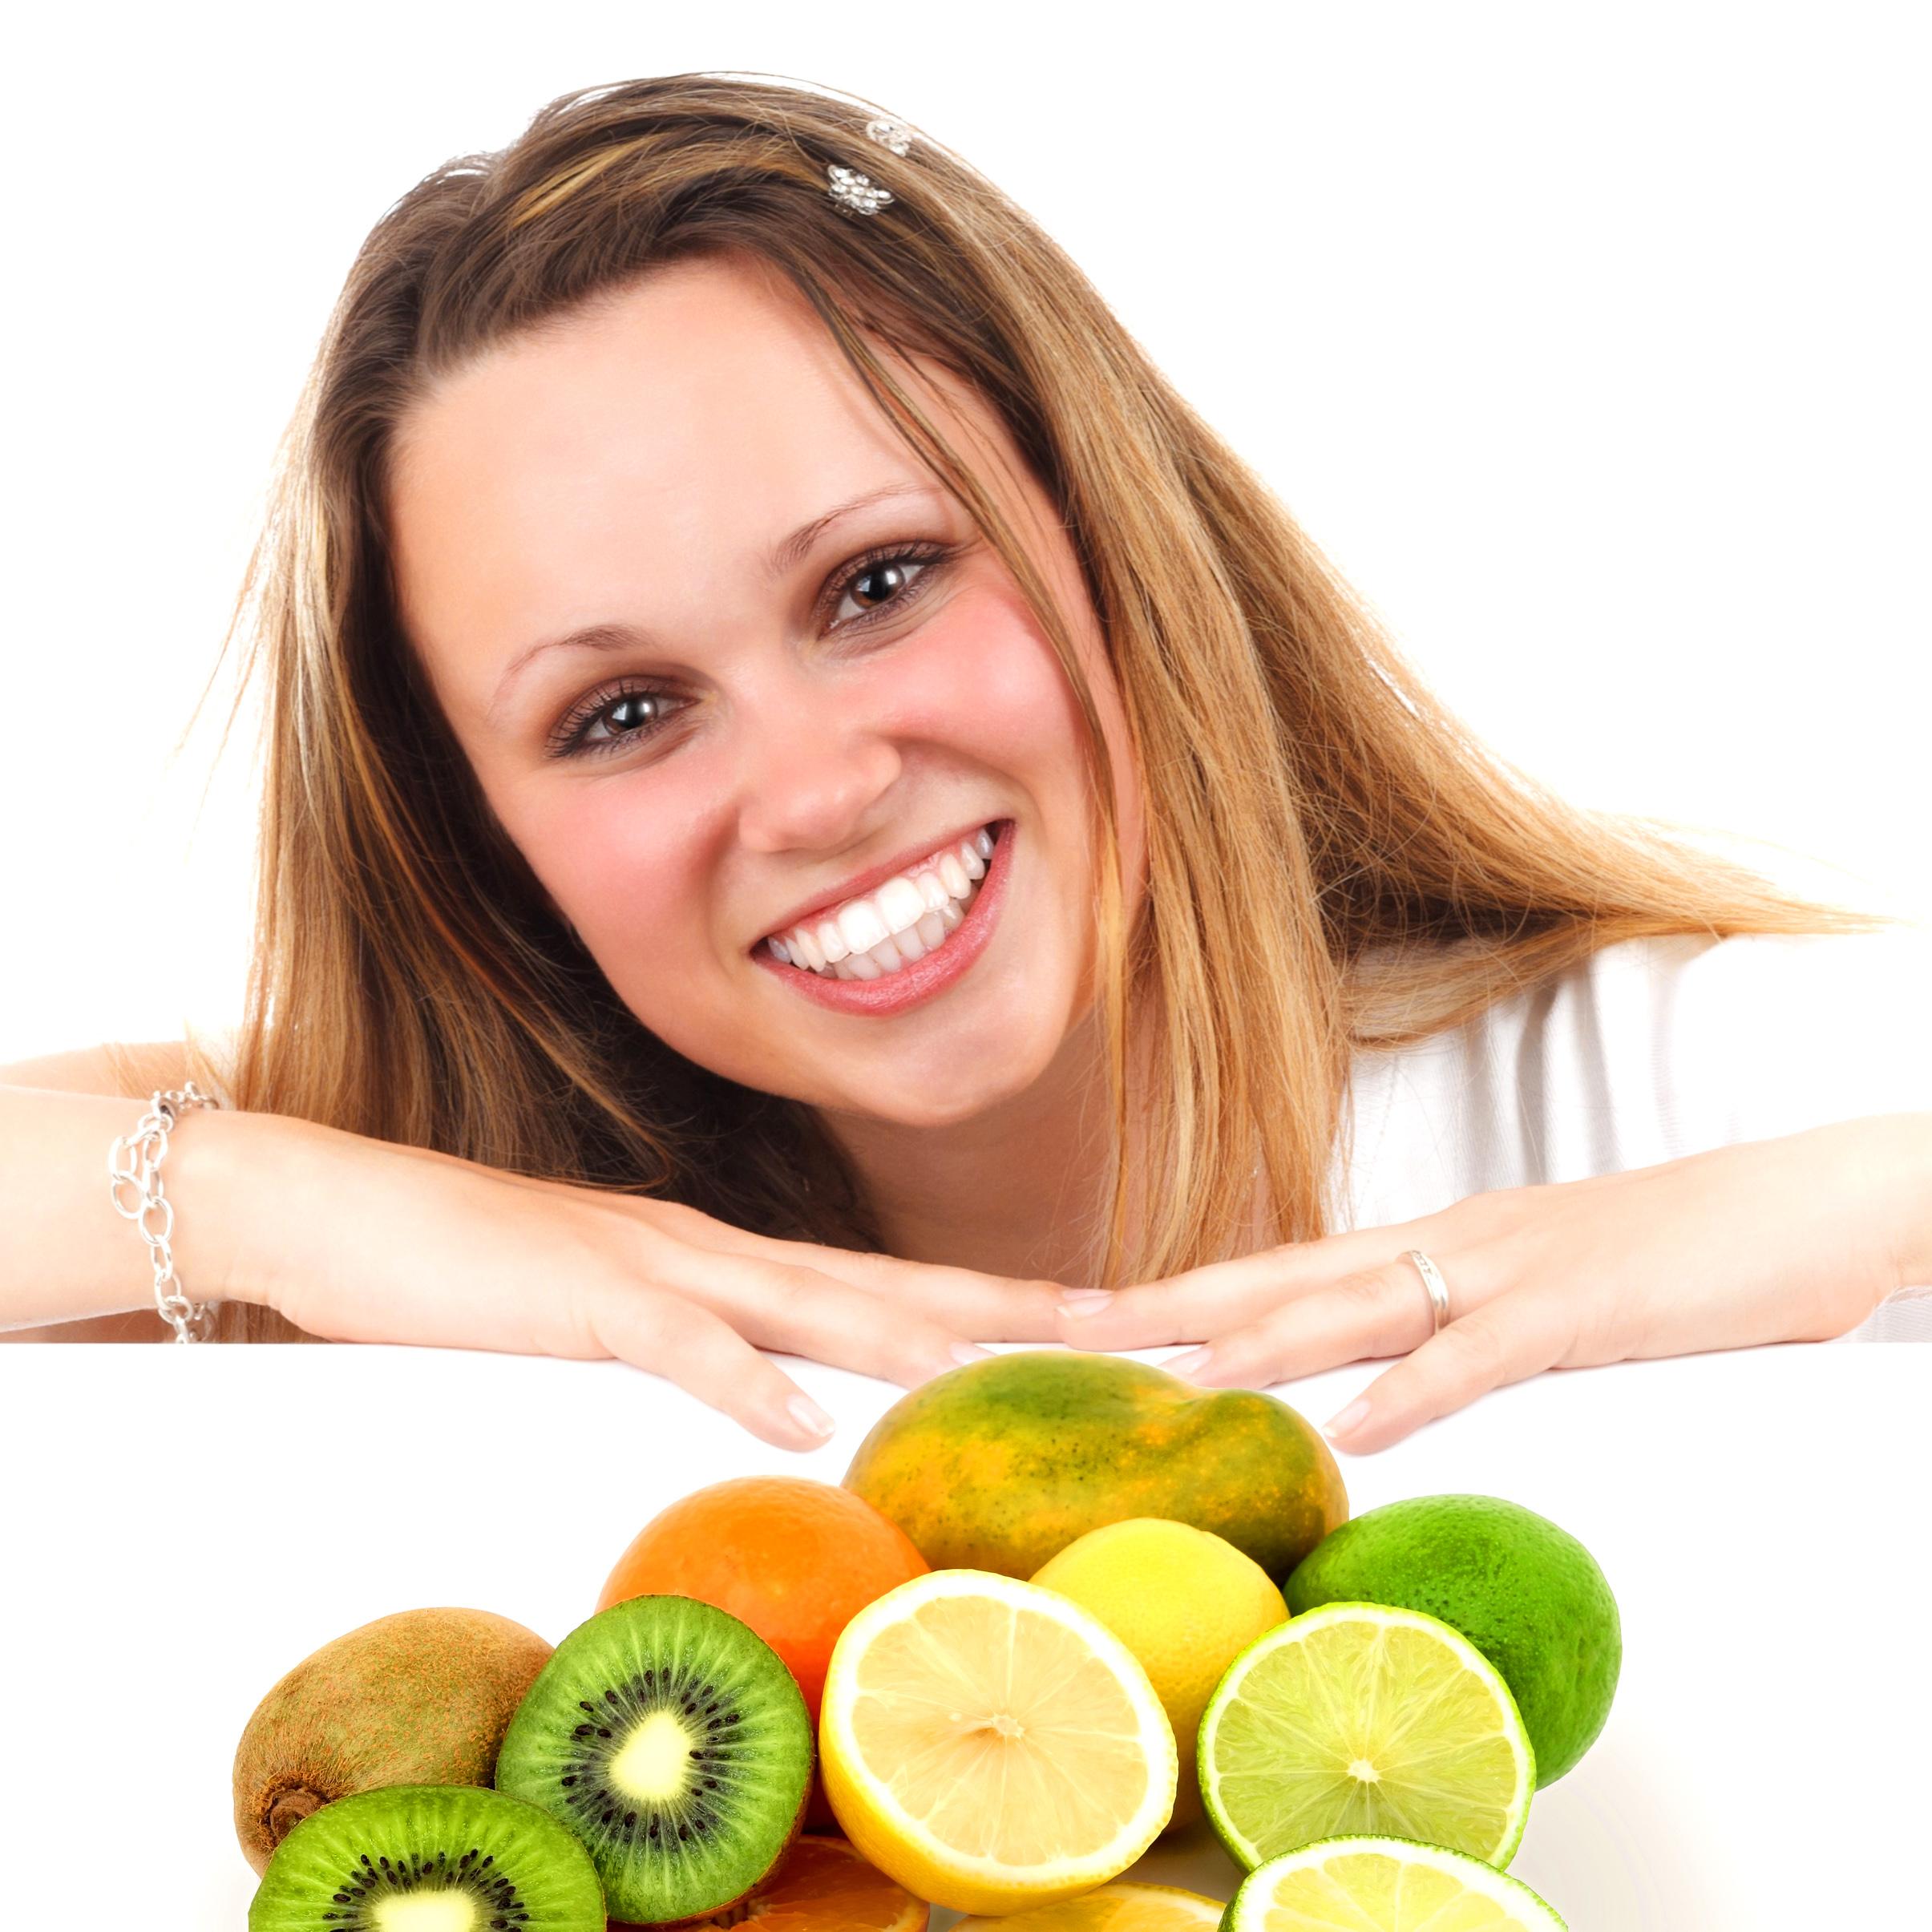 Eat More Fruit - Woman and Assorted Fruit, Adult, Nutrition, Positive, Portrait, HQ Photo